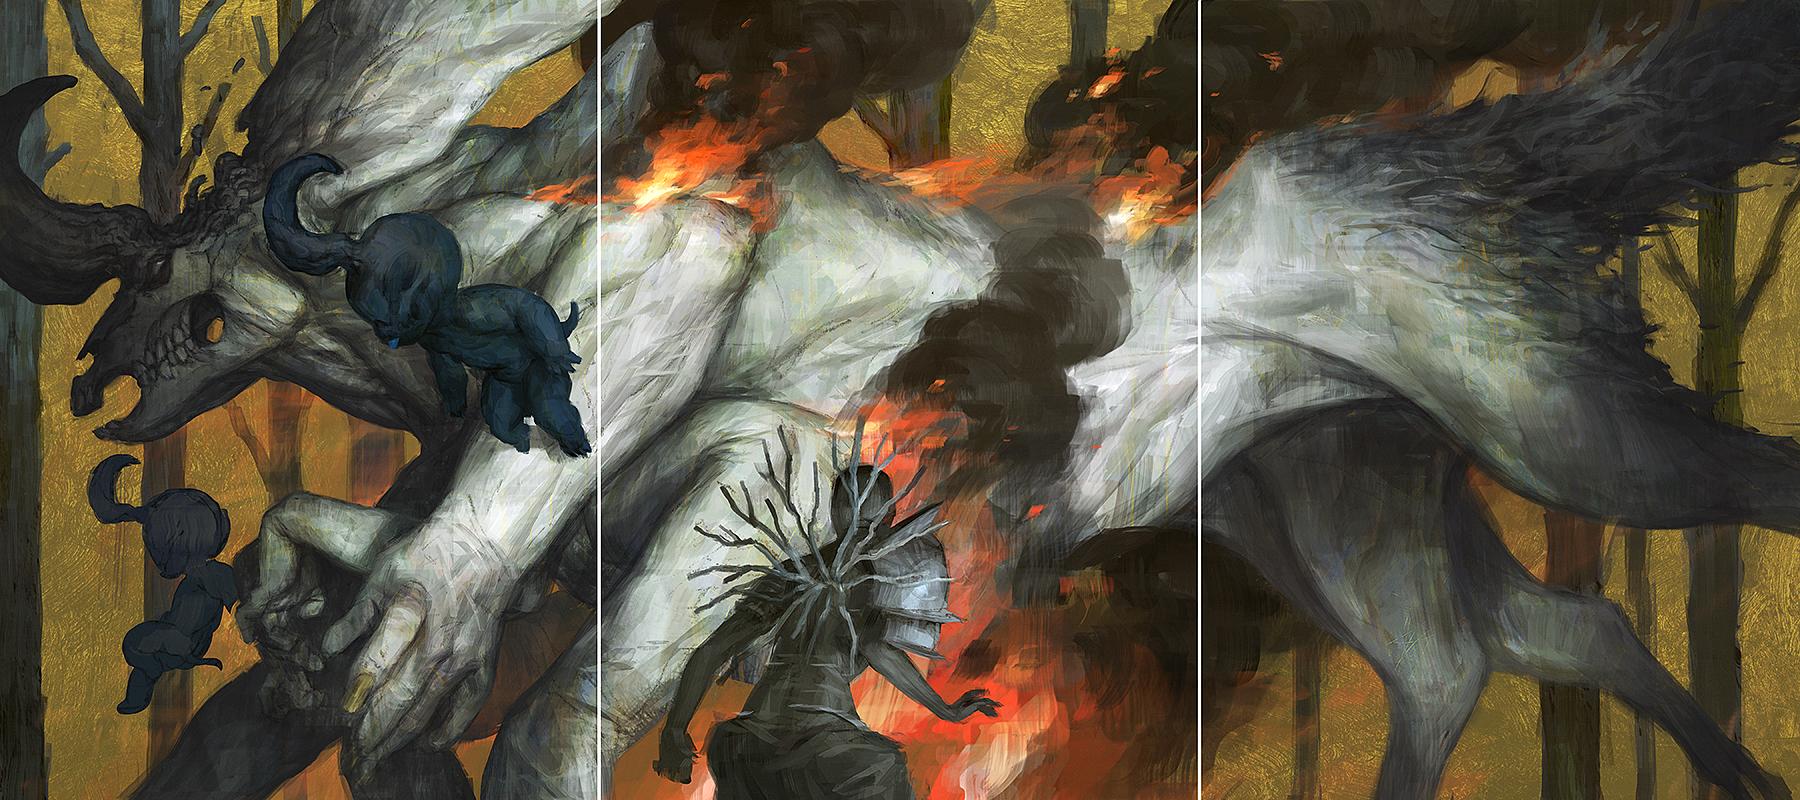 Motherland Chronicles #40 - firewalker by tobiee